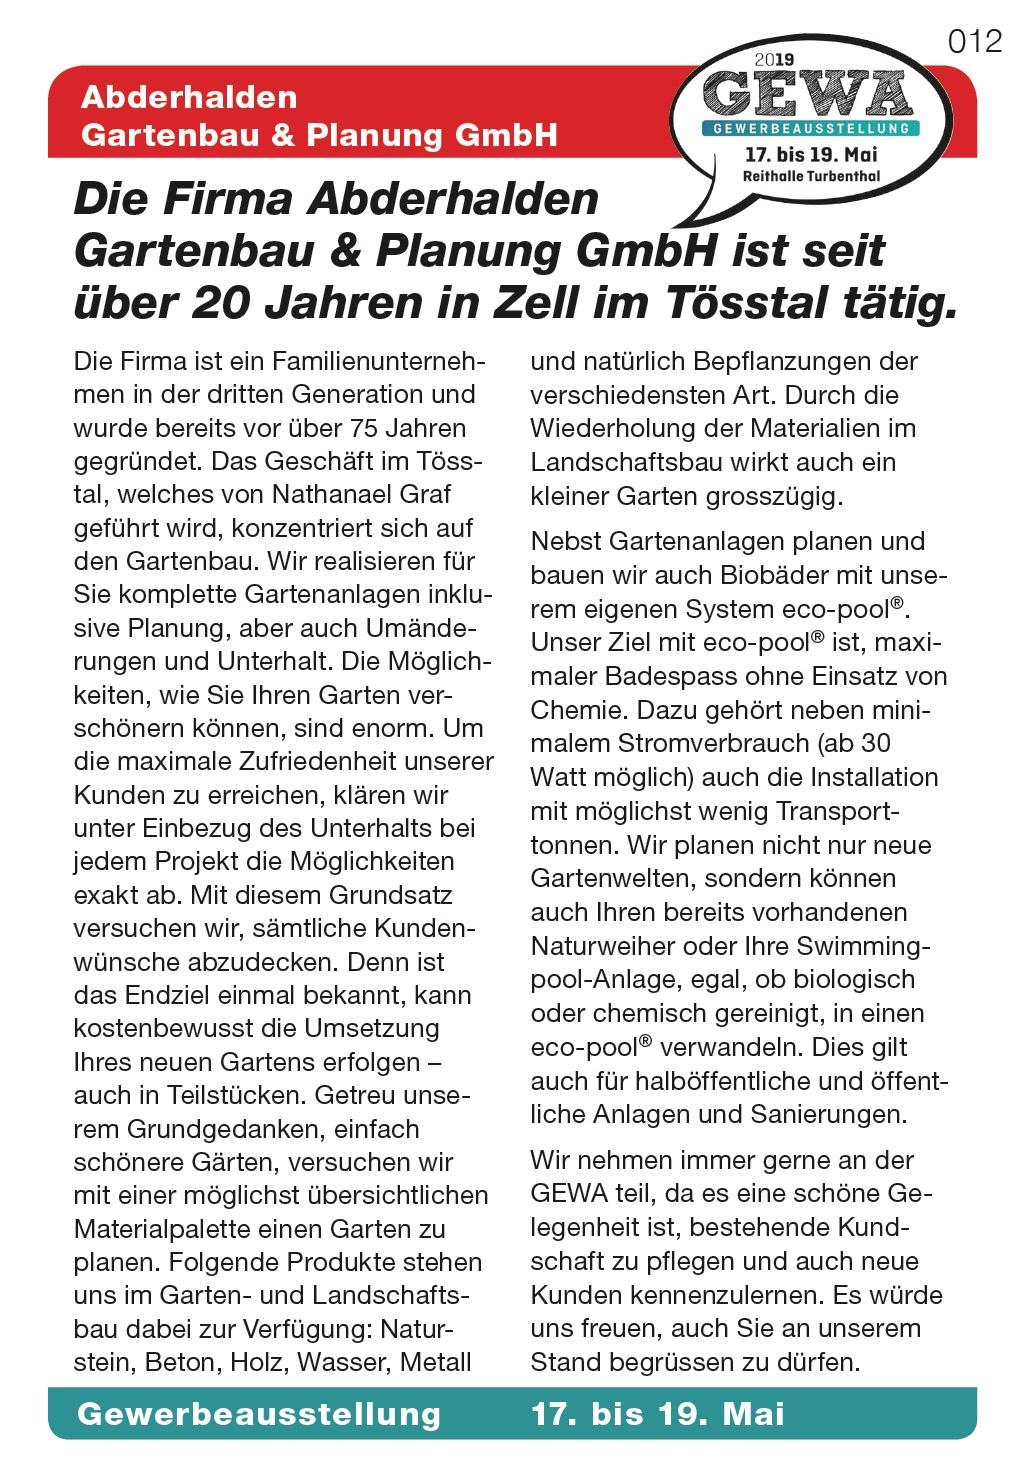 Abderhalden Gartenbau & Planung GmbH